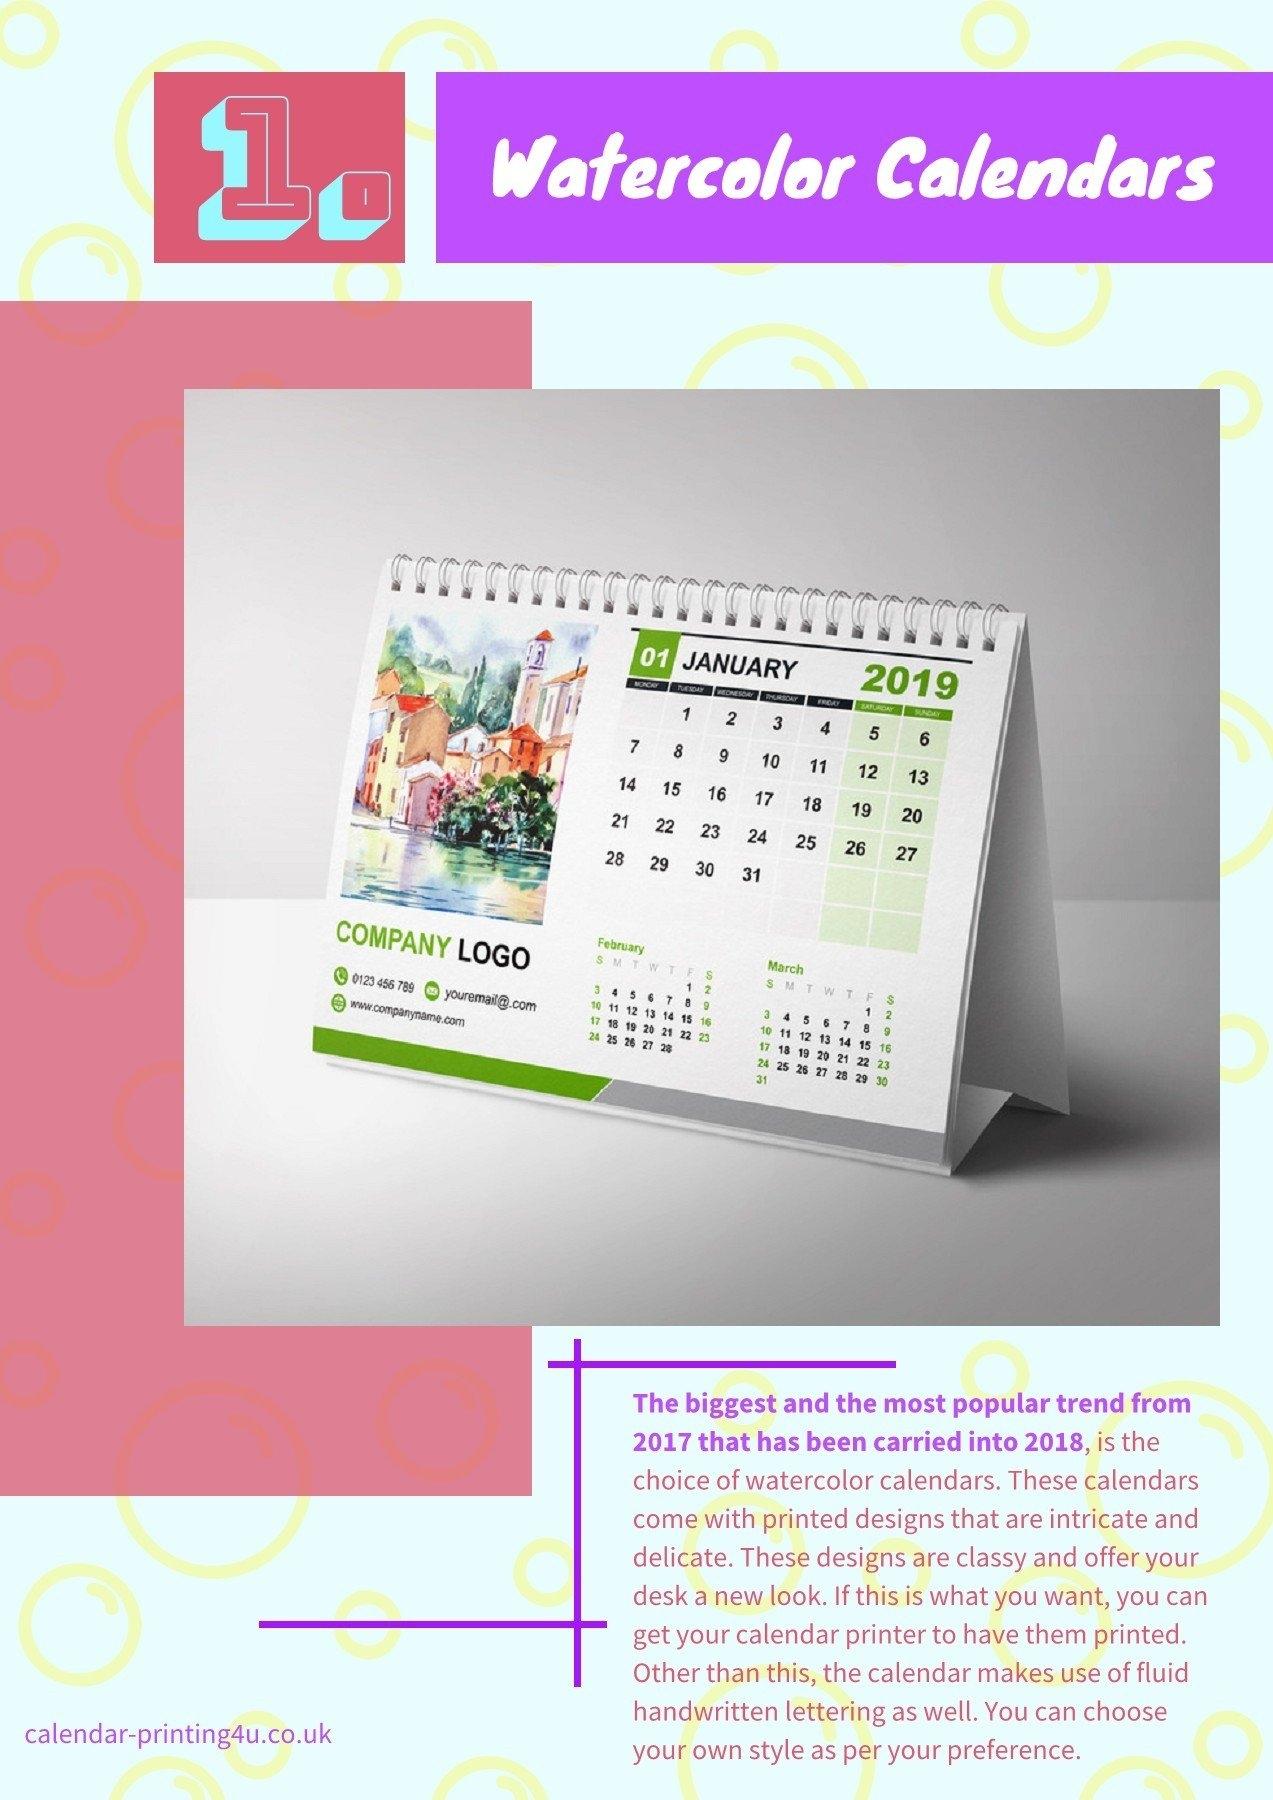 6 Creative Calendar Design Ideas For Your Desk For The Year 2019 Calendar 2019 Ideas